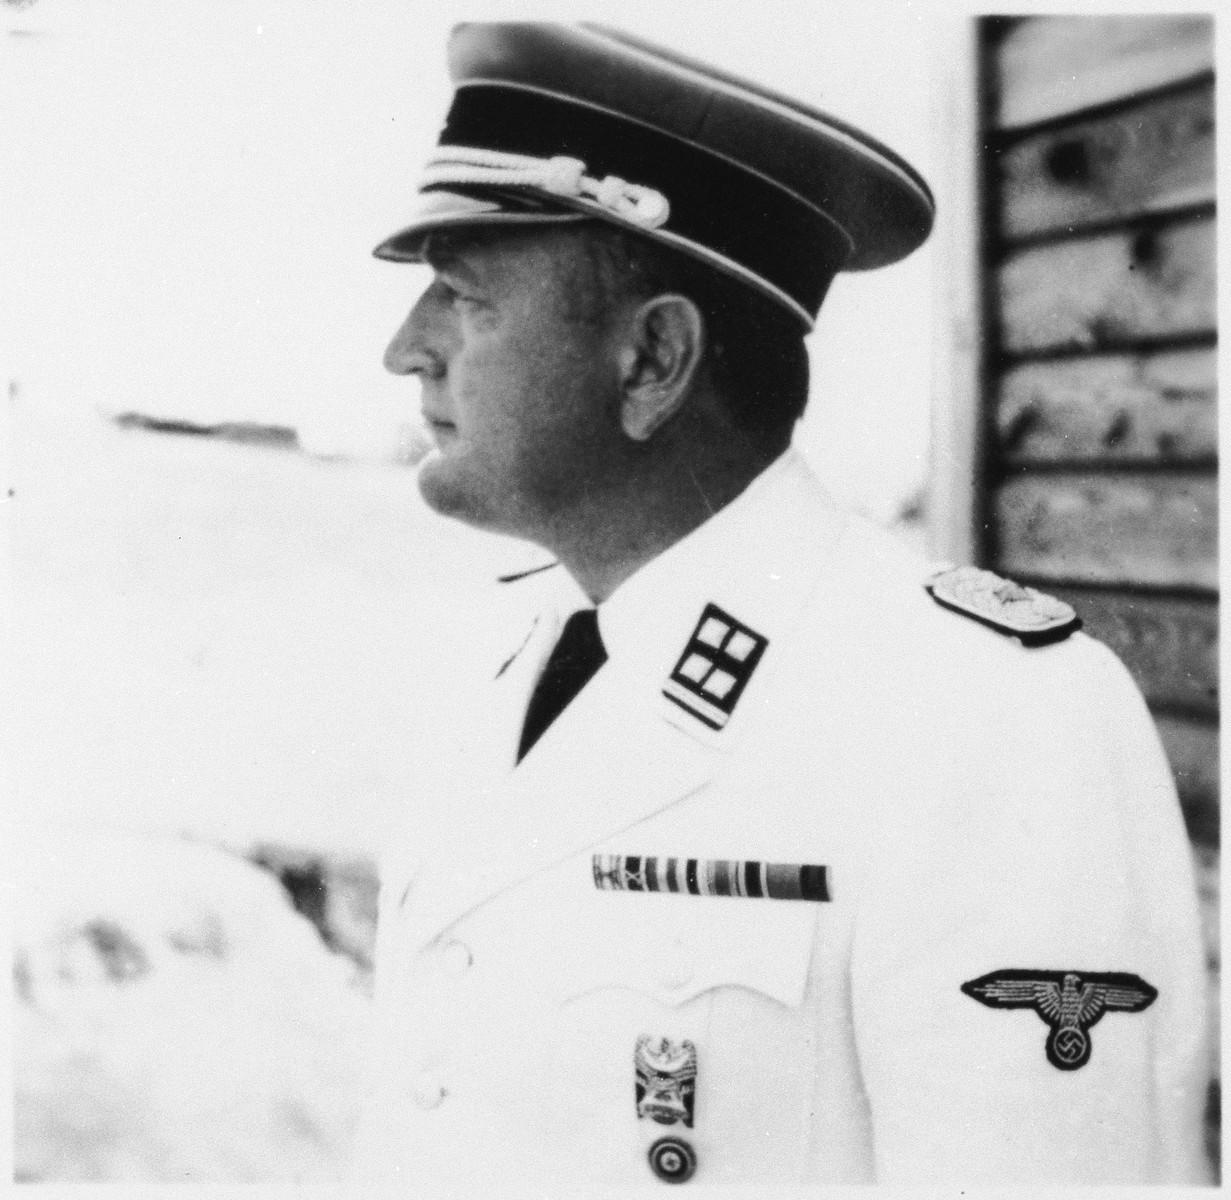 The commander of Gross-Rosen, SS- Obersturmbannfuehrer Arthur Roedl.